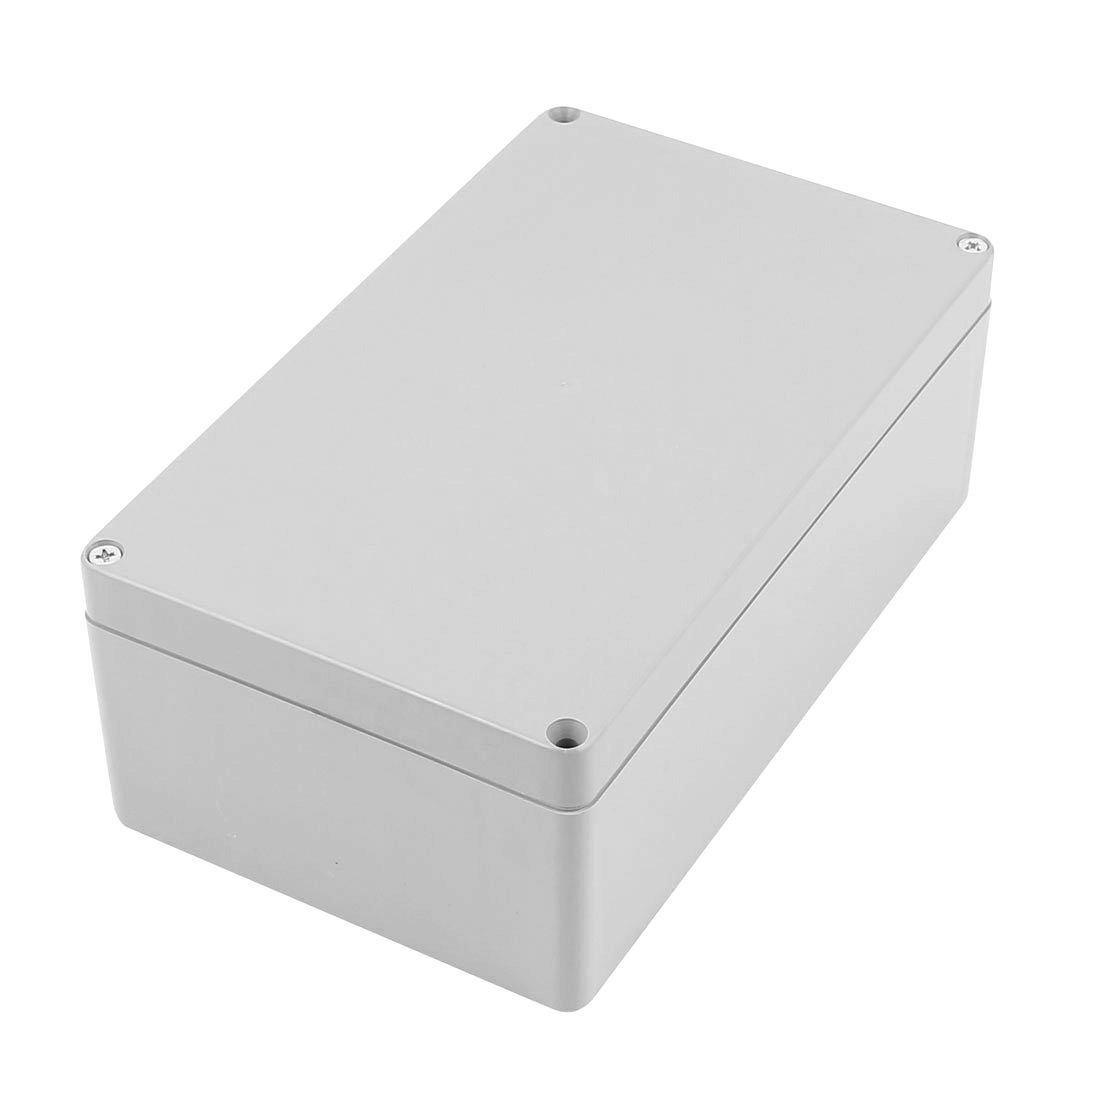 Ocharzy Waterproof Rectangle Project Enclosure Case Junction Box (200x120x75 mm)